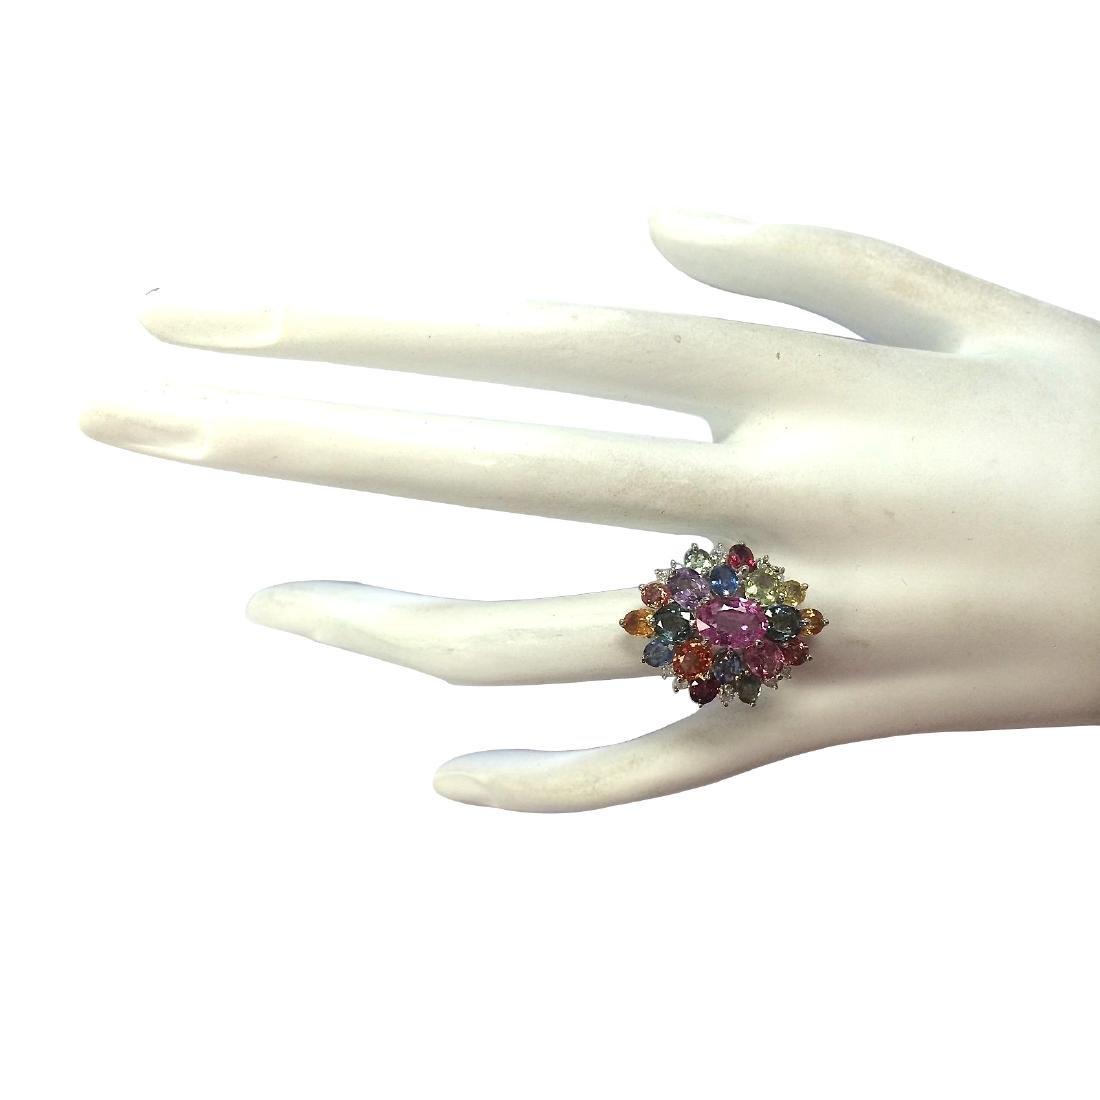 7.63Ct Natural Ceylon Sapphire And Diamond Ring In18K - 4